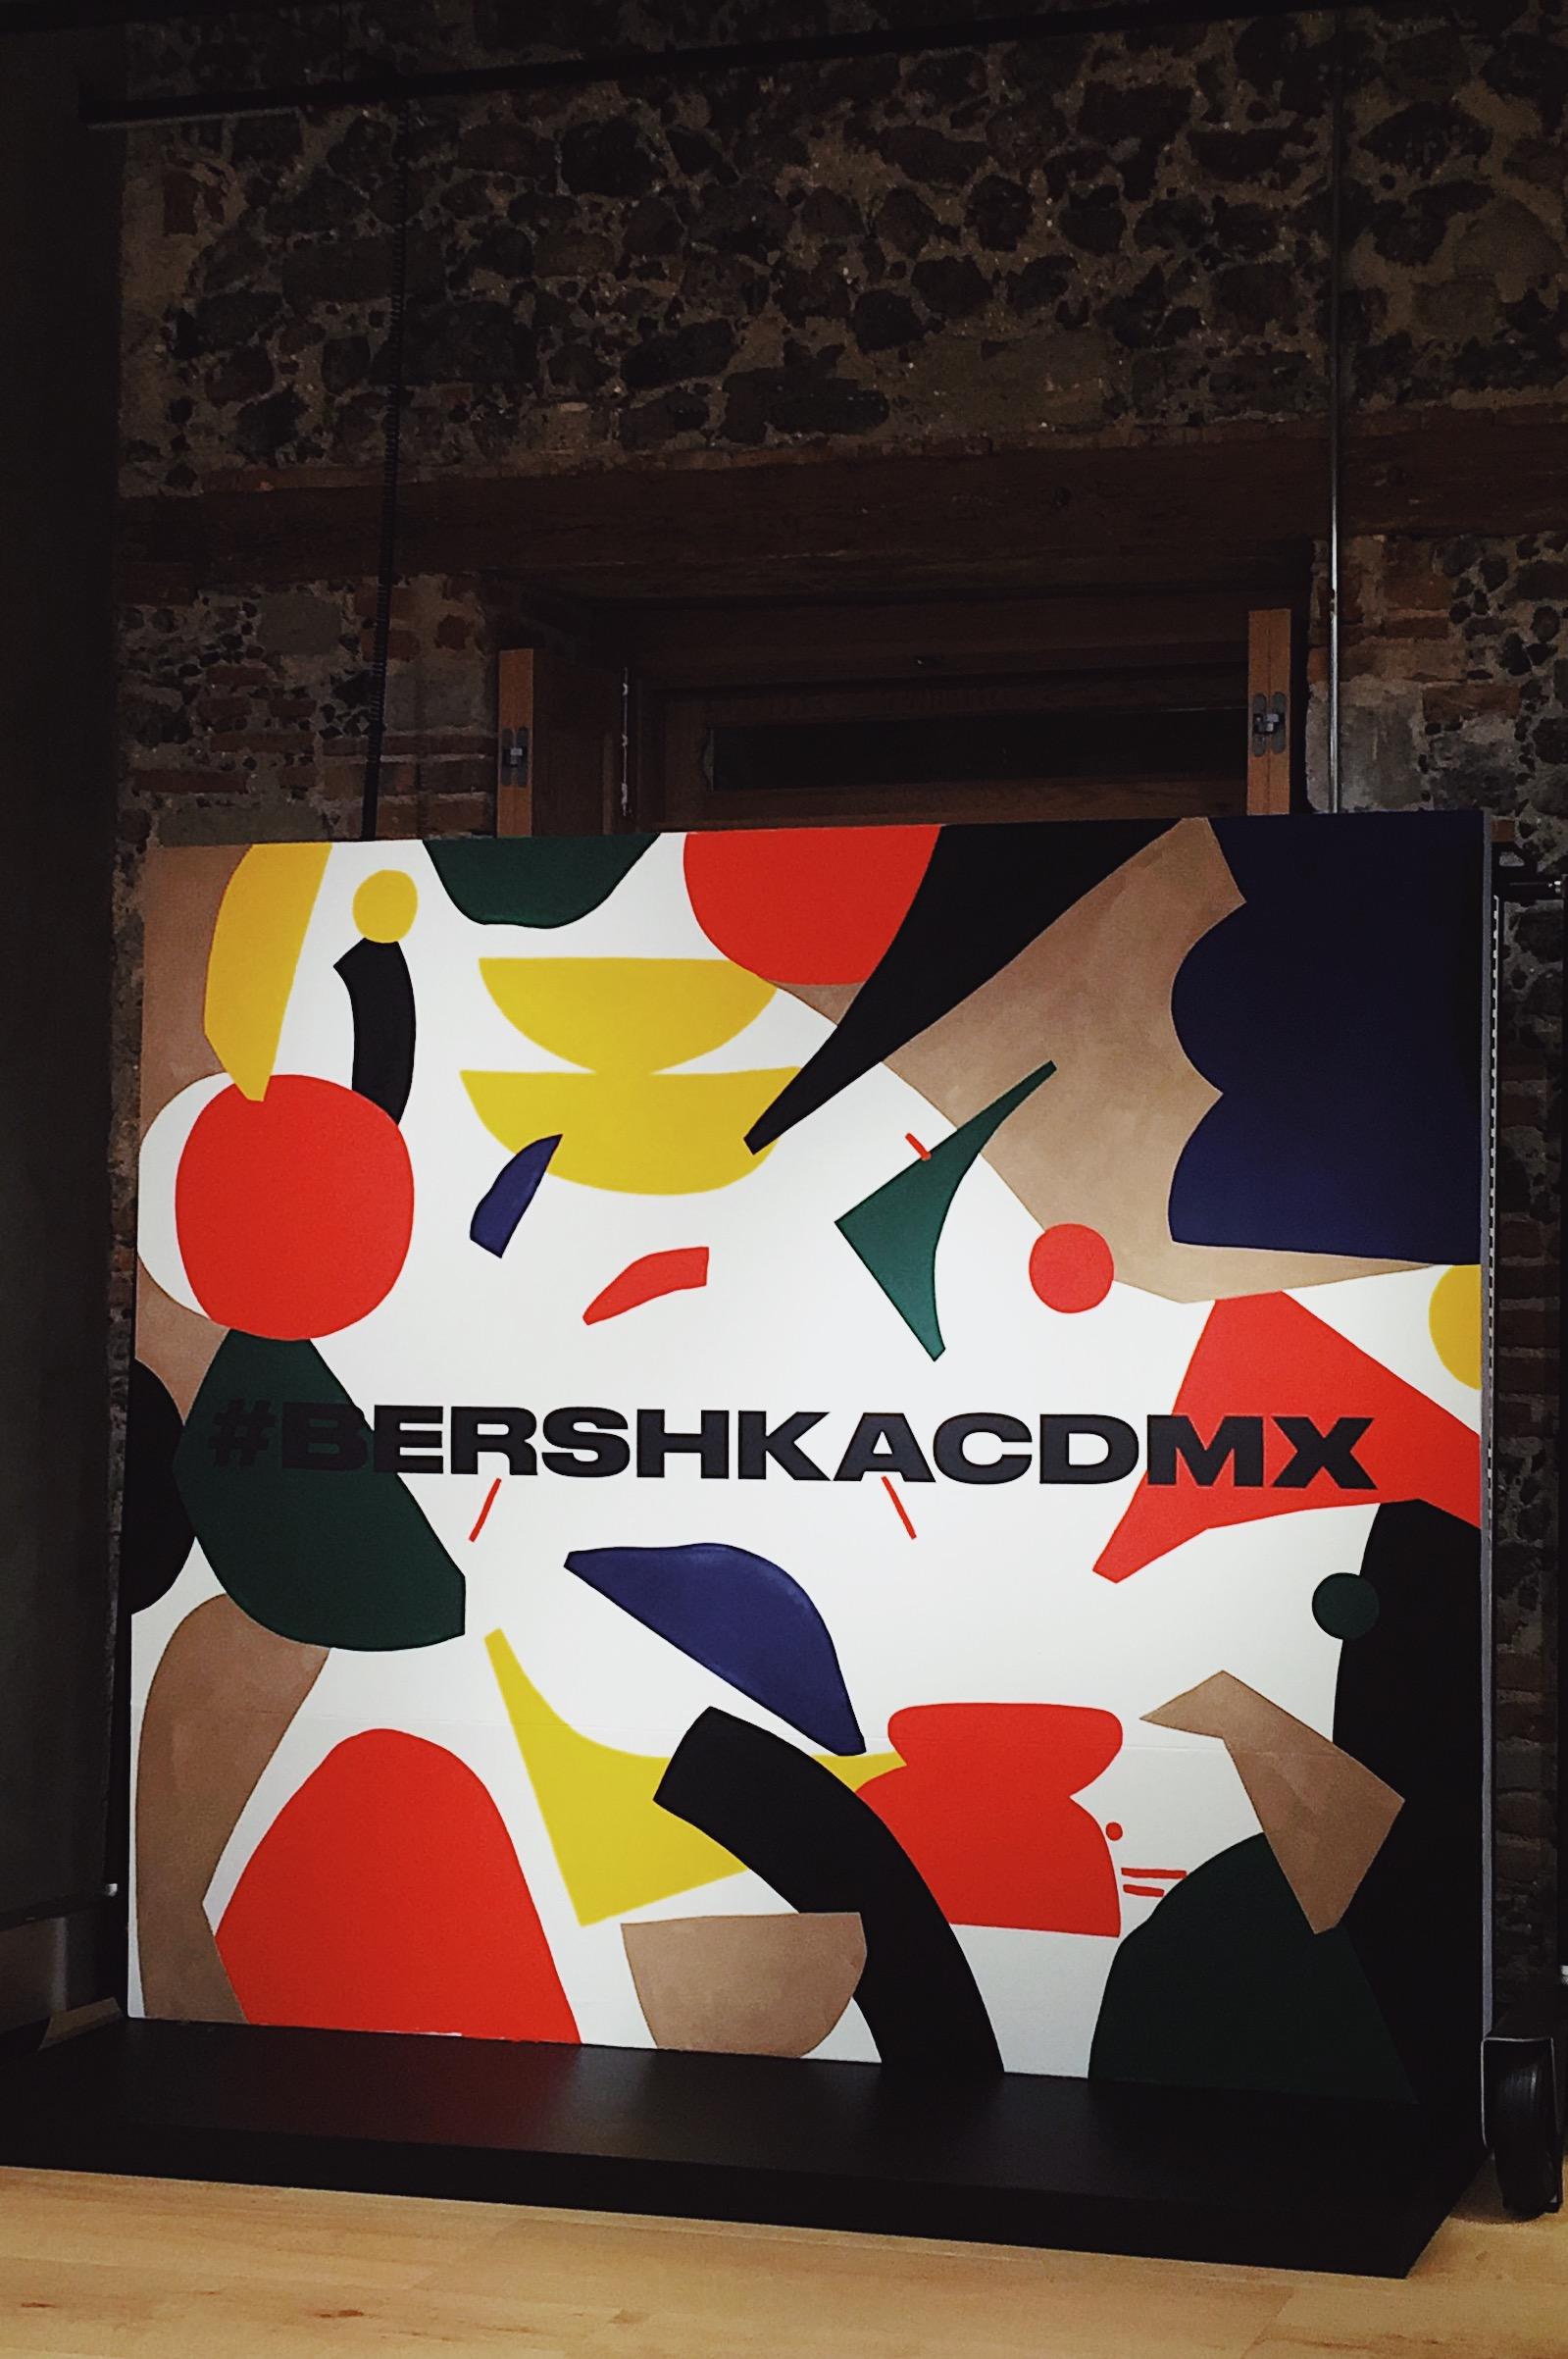 Bershka CDMX